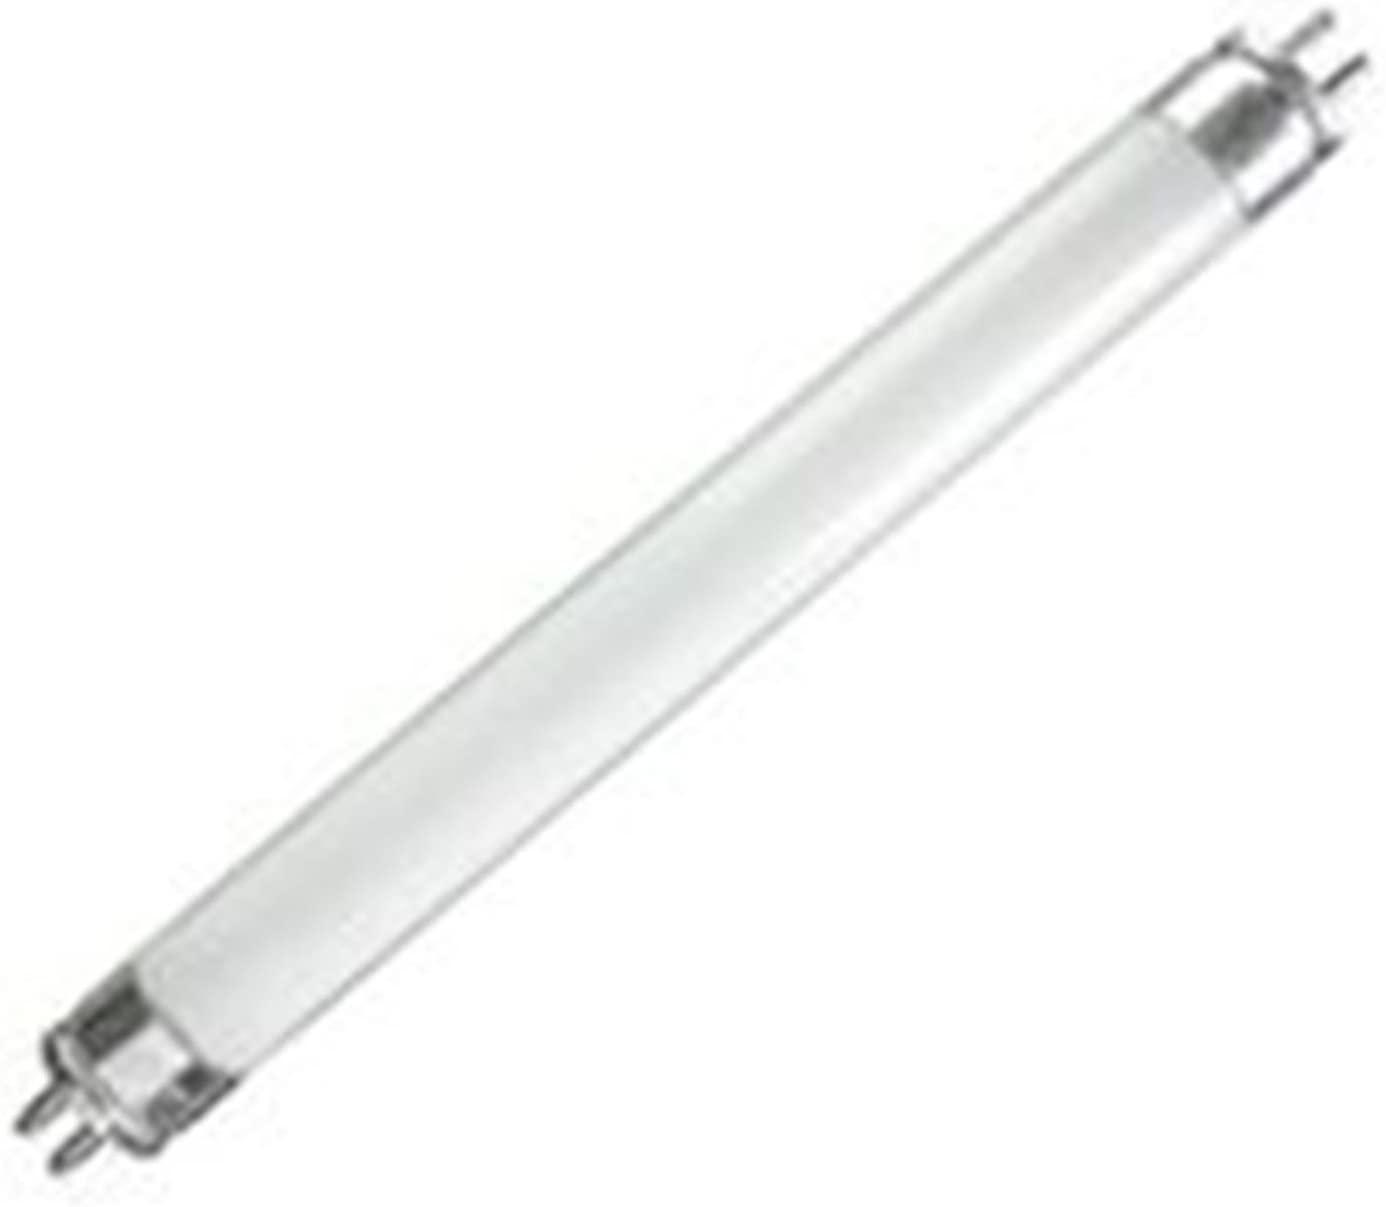 50 Qty. Halco F8 T5 Warm White ProLume F8T5WW 8w Linear Fluorescent Preheat Warm White Lamp Bulb